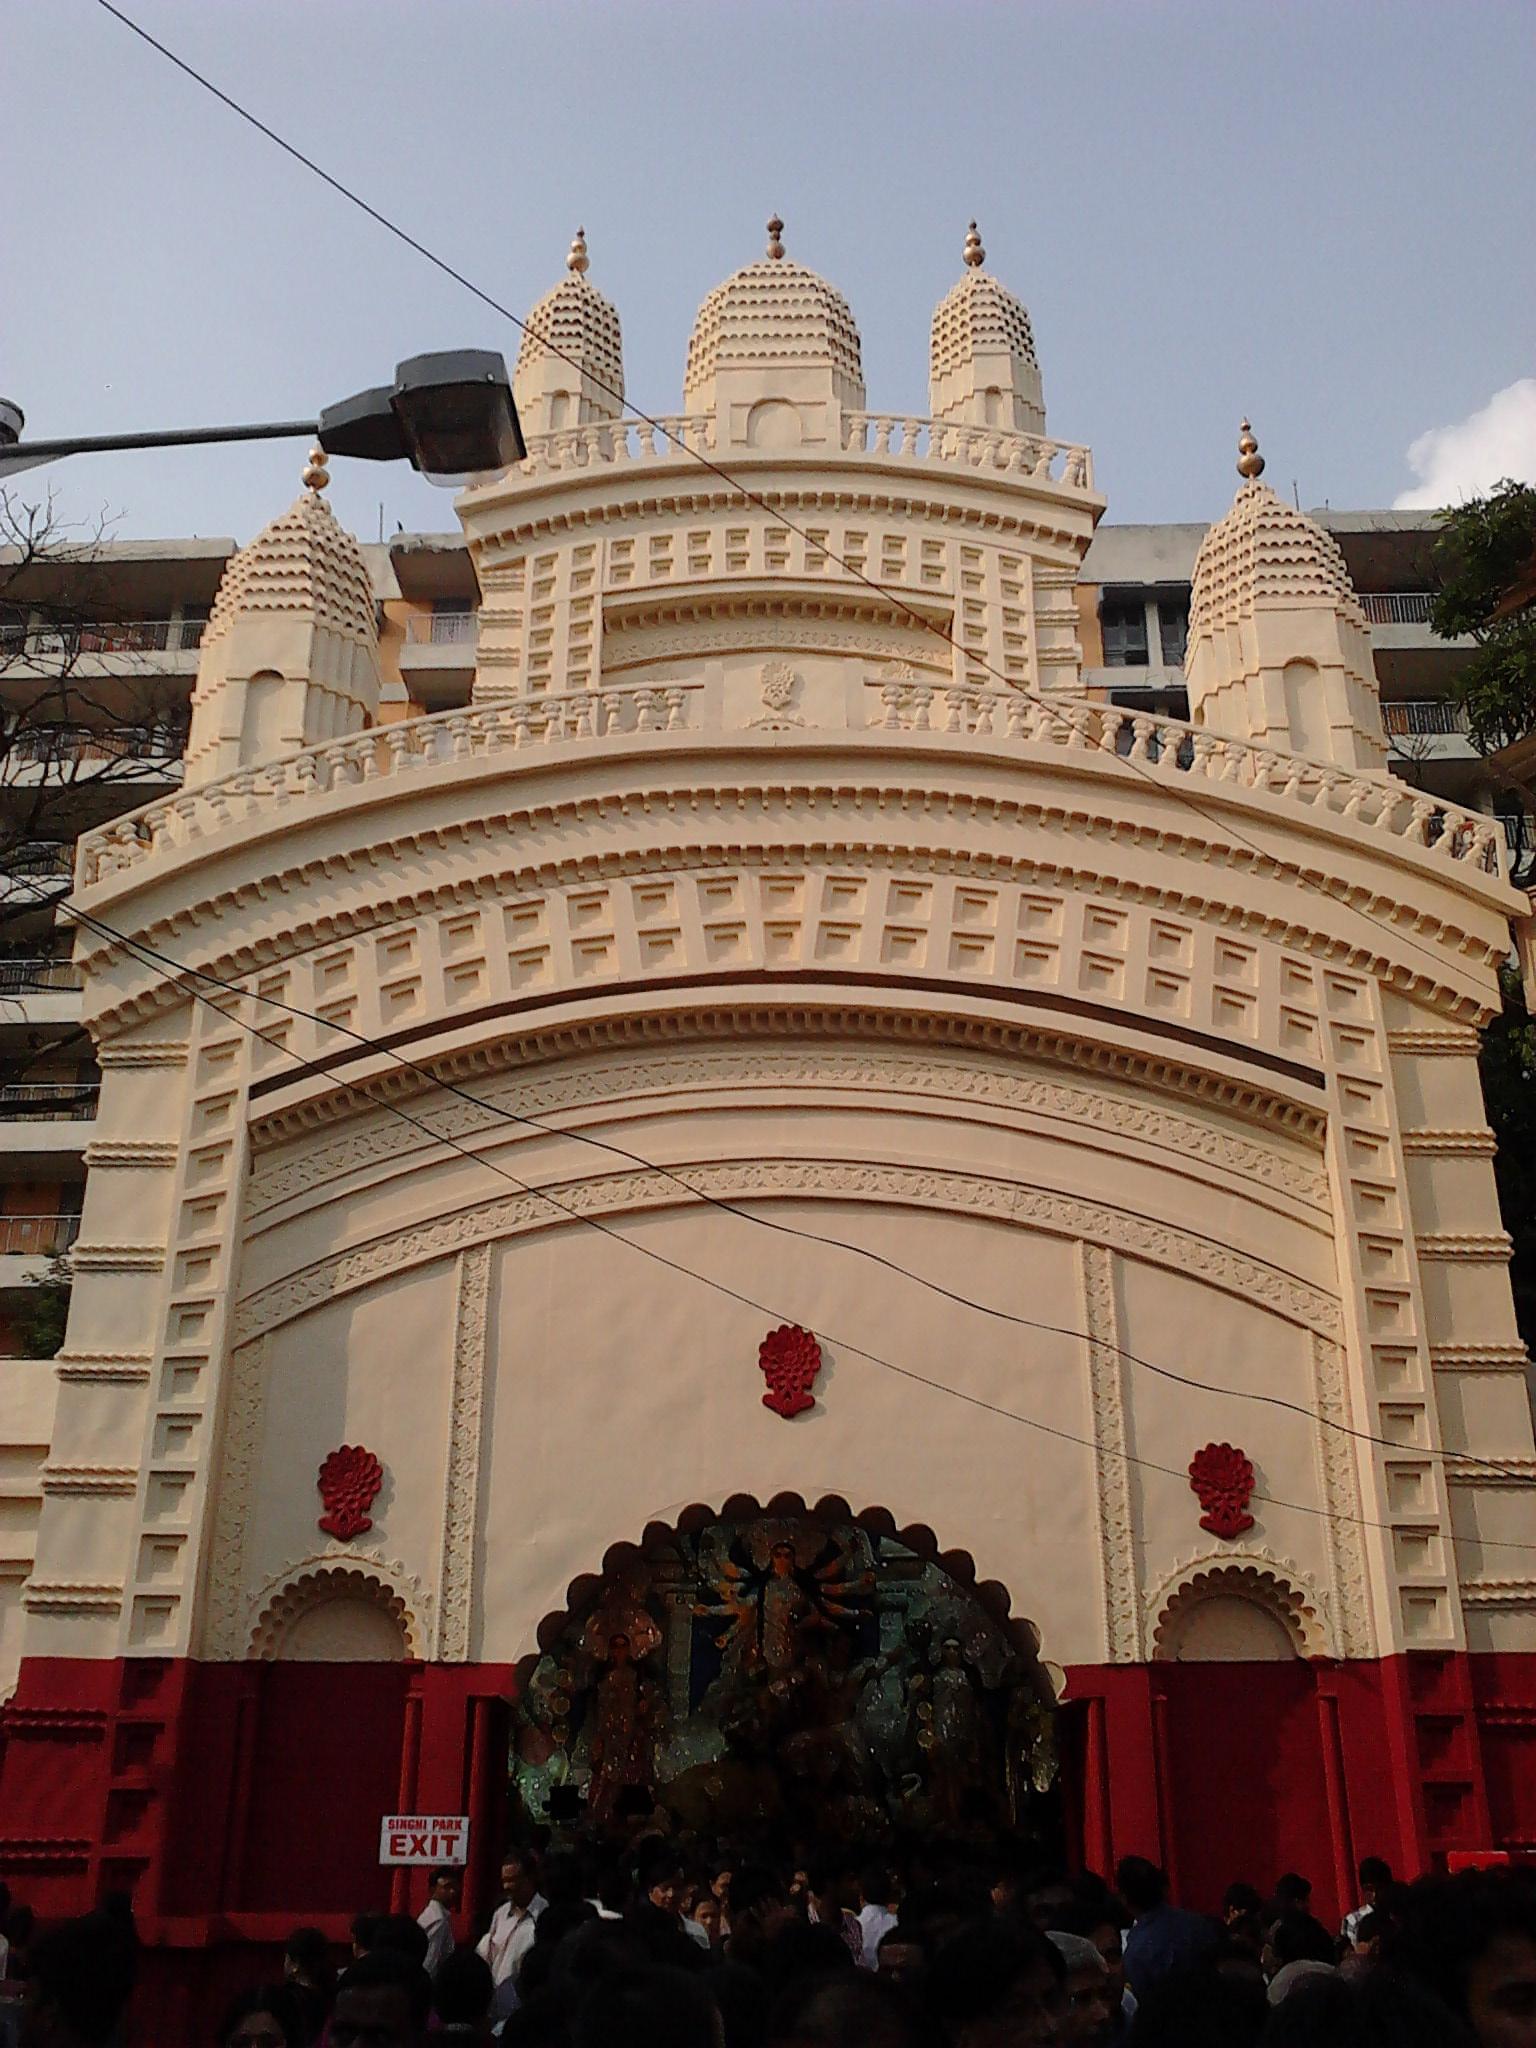 Filedurga puja pandal singhi park kolkata 2011 10 03 00660g filedurga puja pandal singhi park kolkata 2011 10 03 00660 altavistaventures Image collections